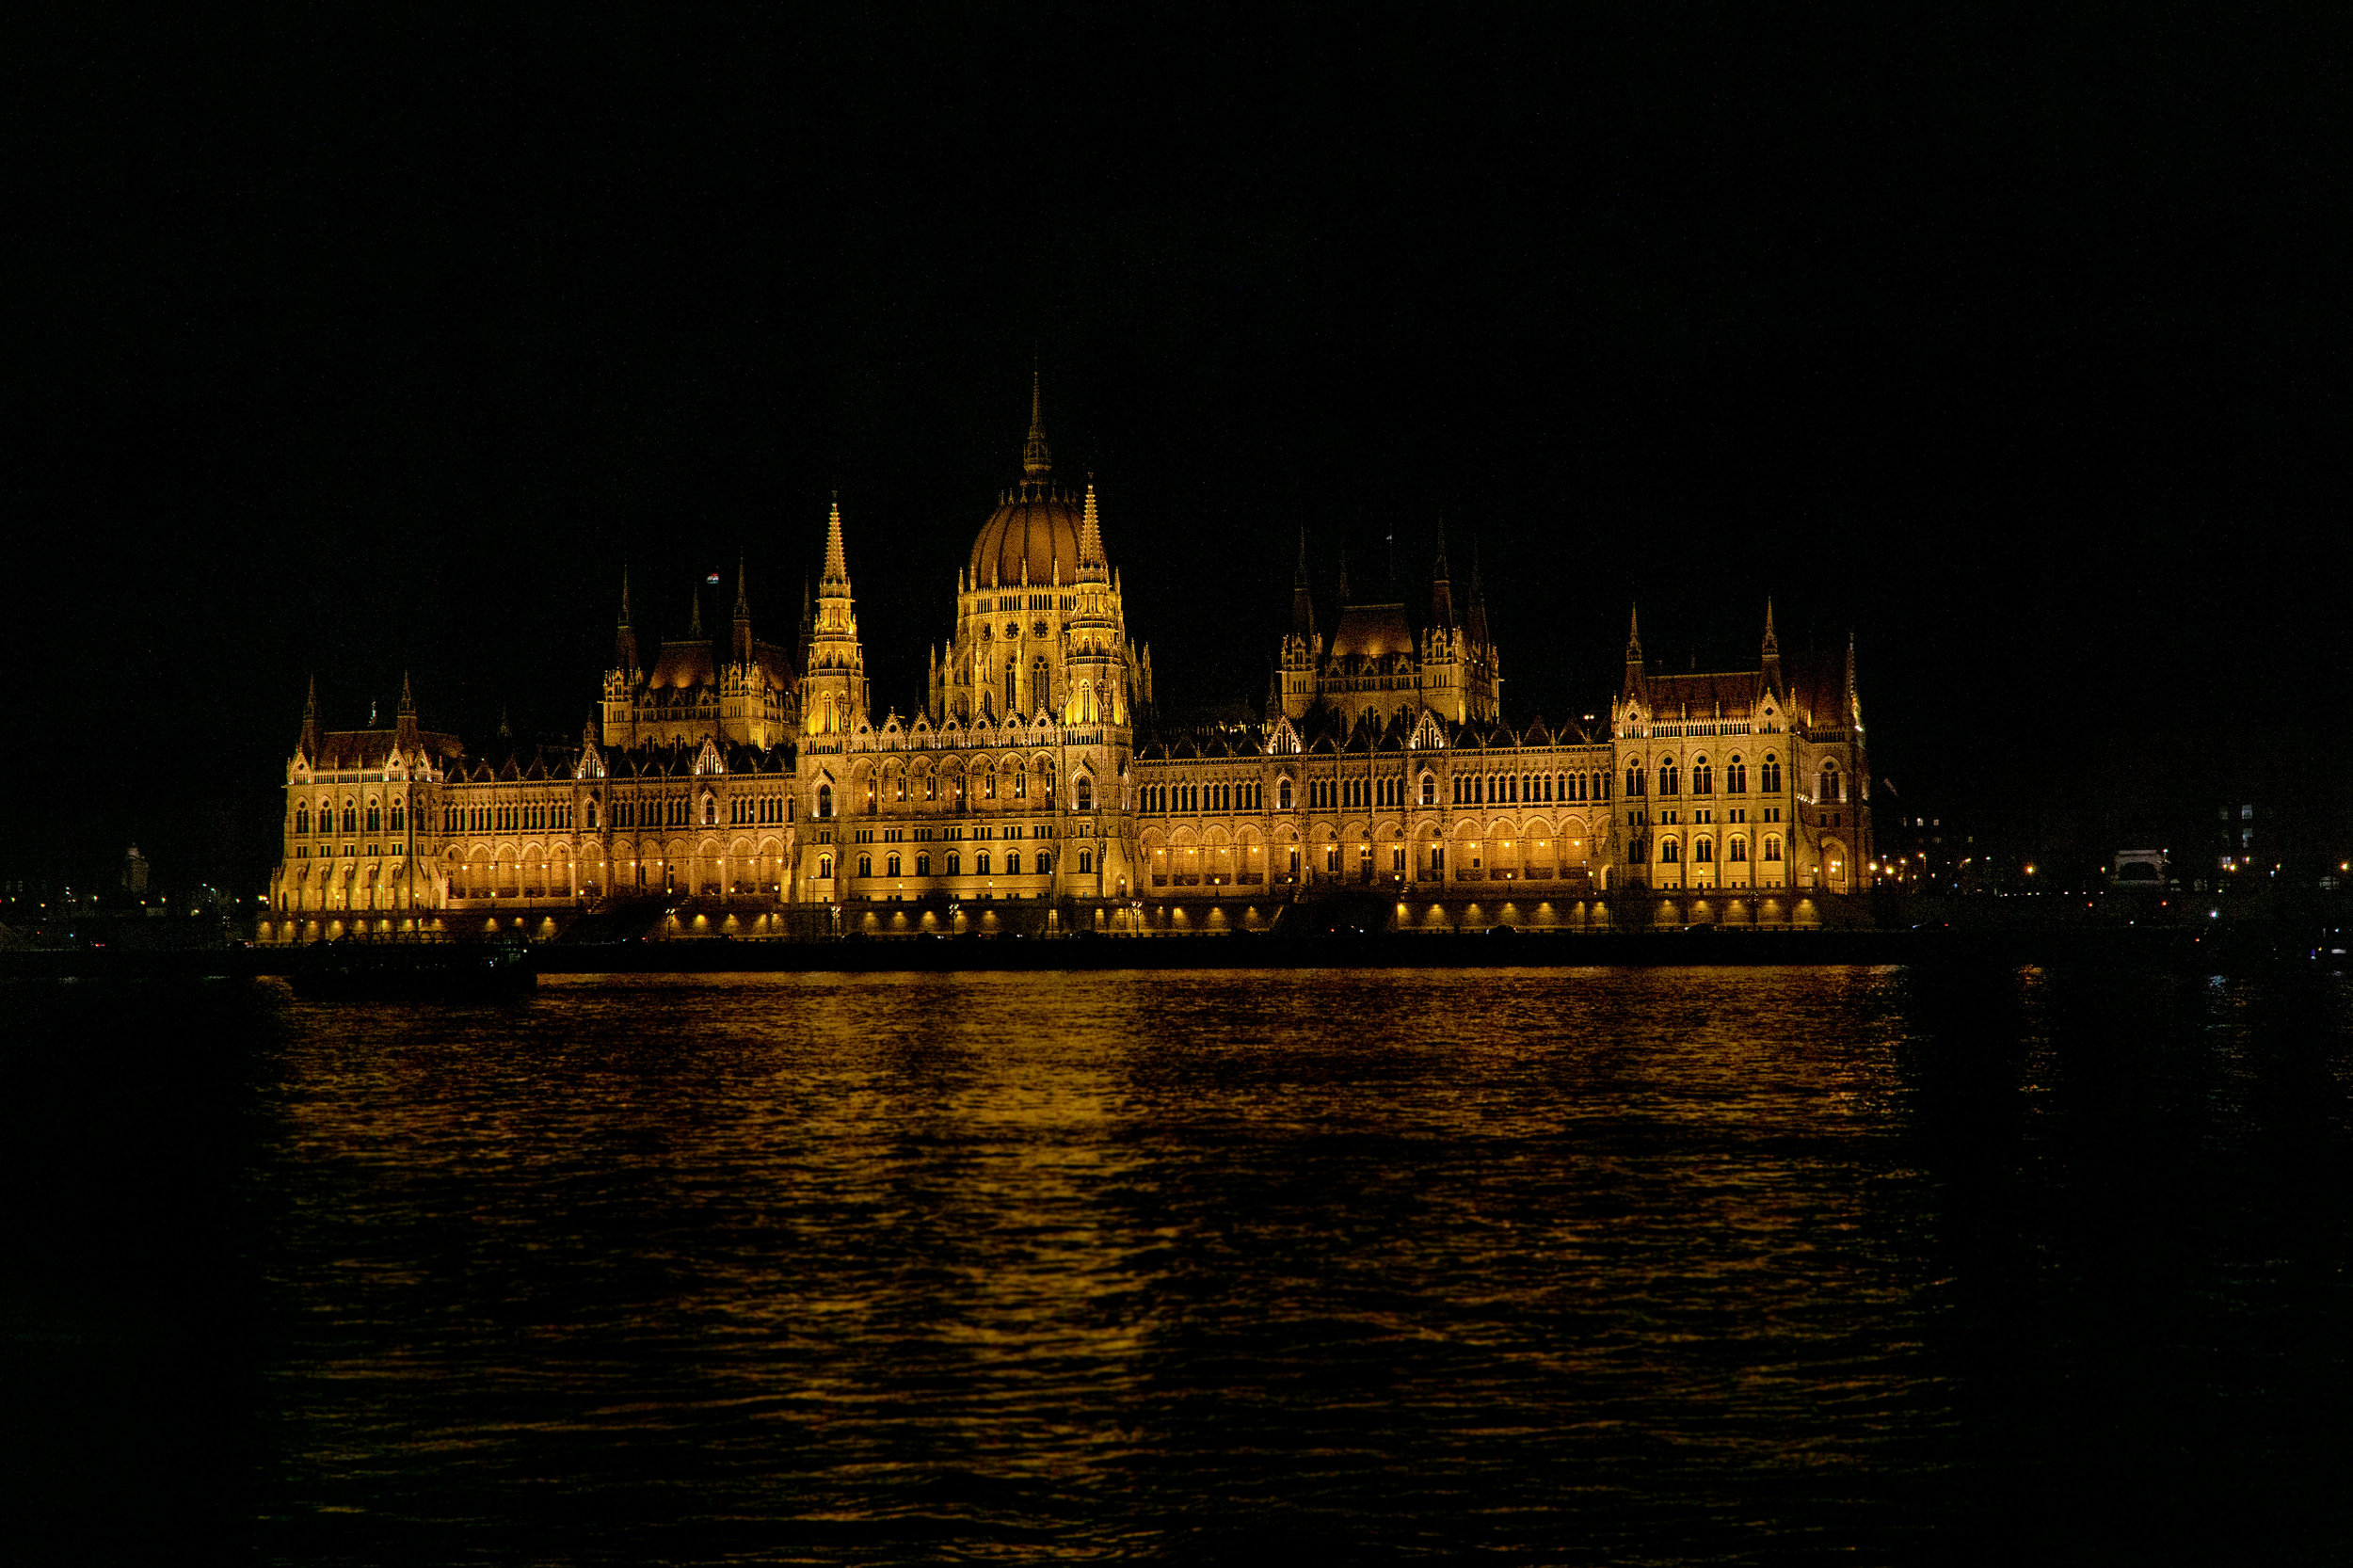 budapest_parliament_building_vickygood_travel_photography3sm.jpg